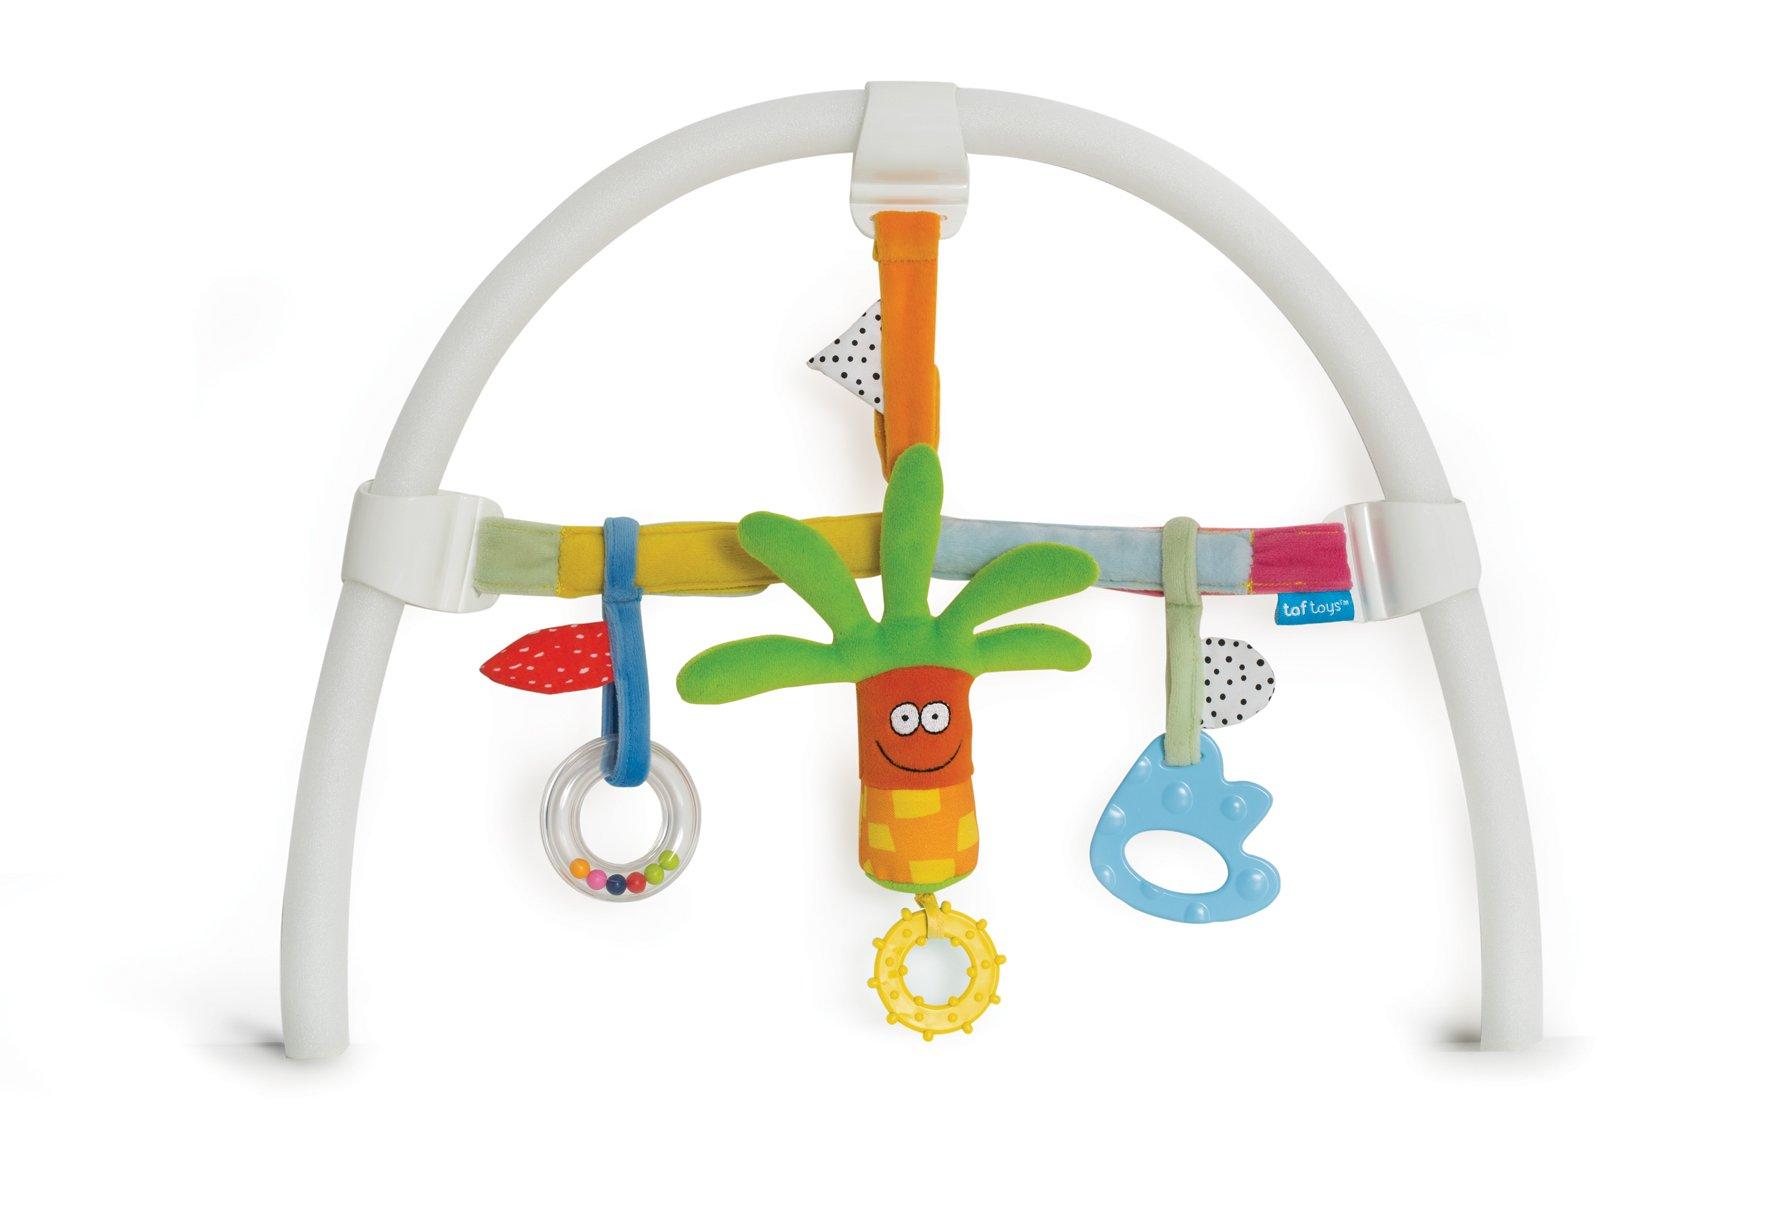 Taf Toys Clip-on Pram Toy. Baby Pram Activity Bar